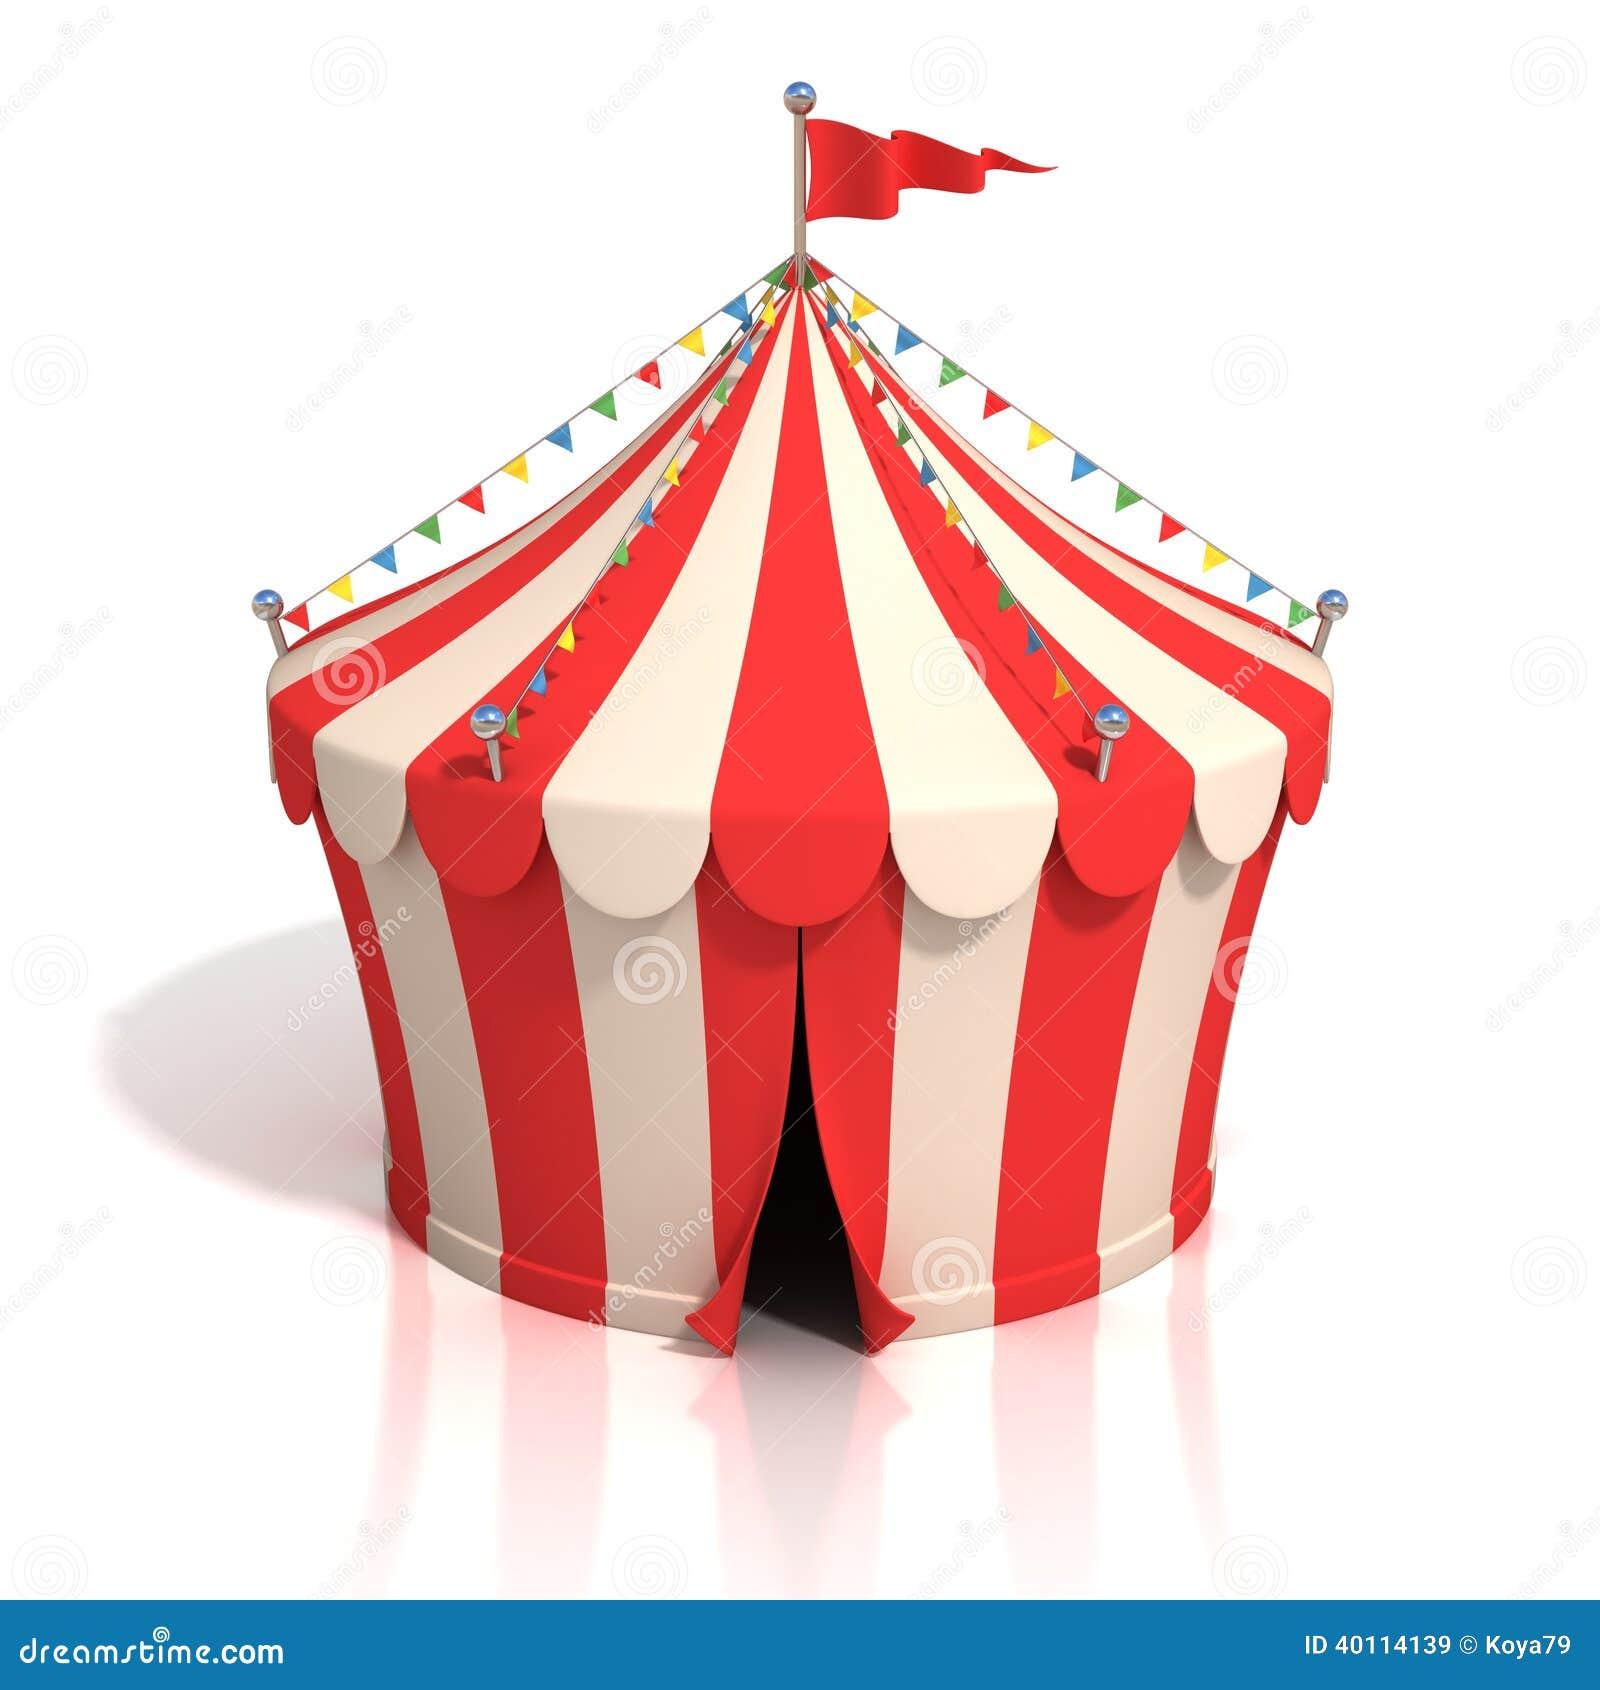 Circus Tent 3d Illustr...